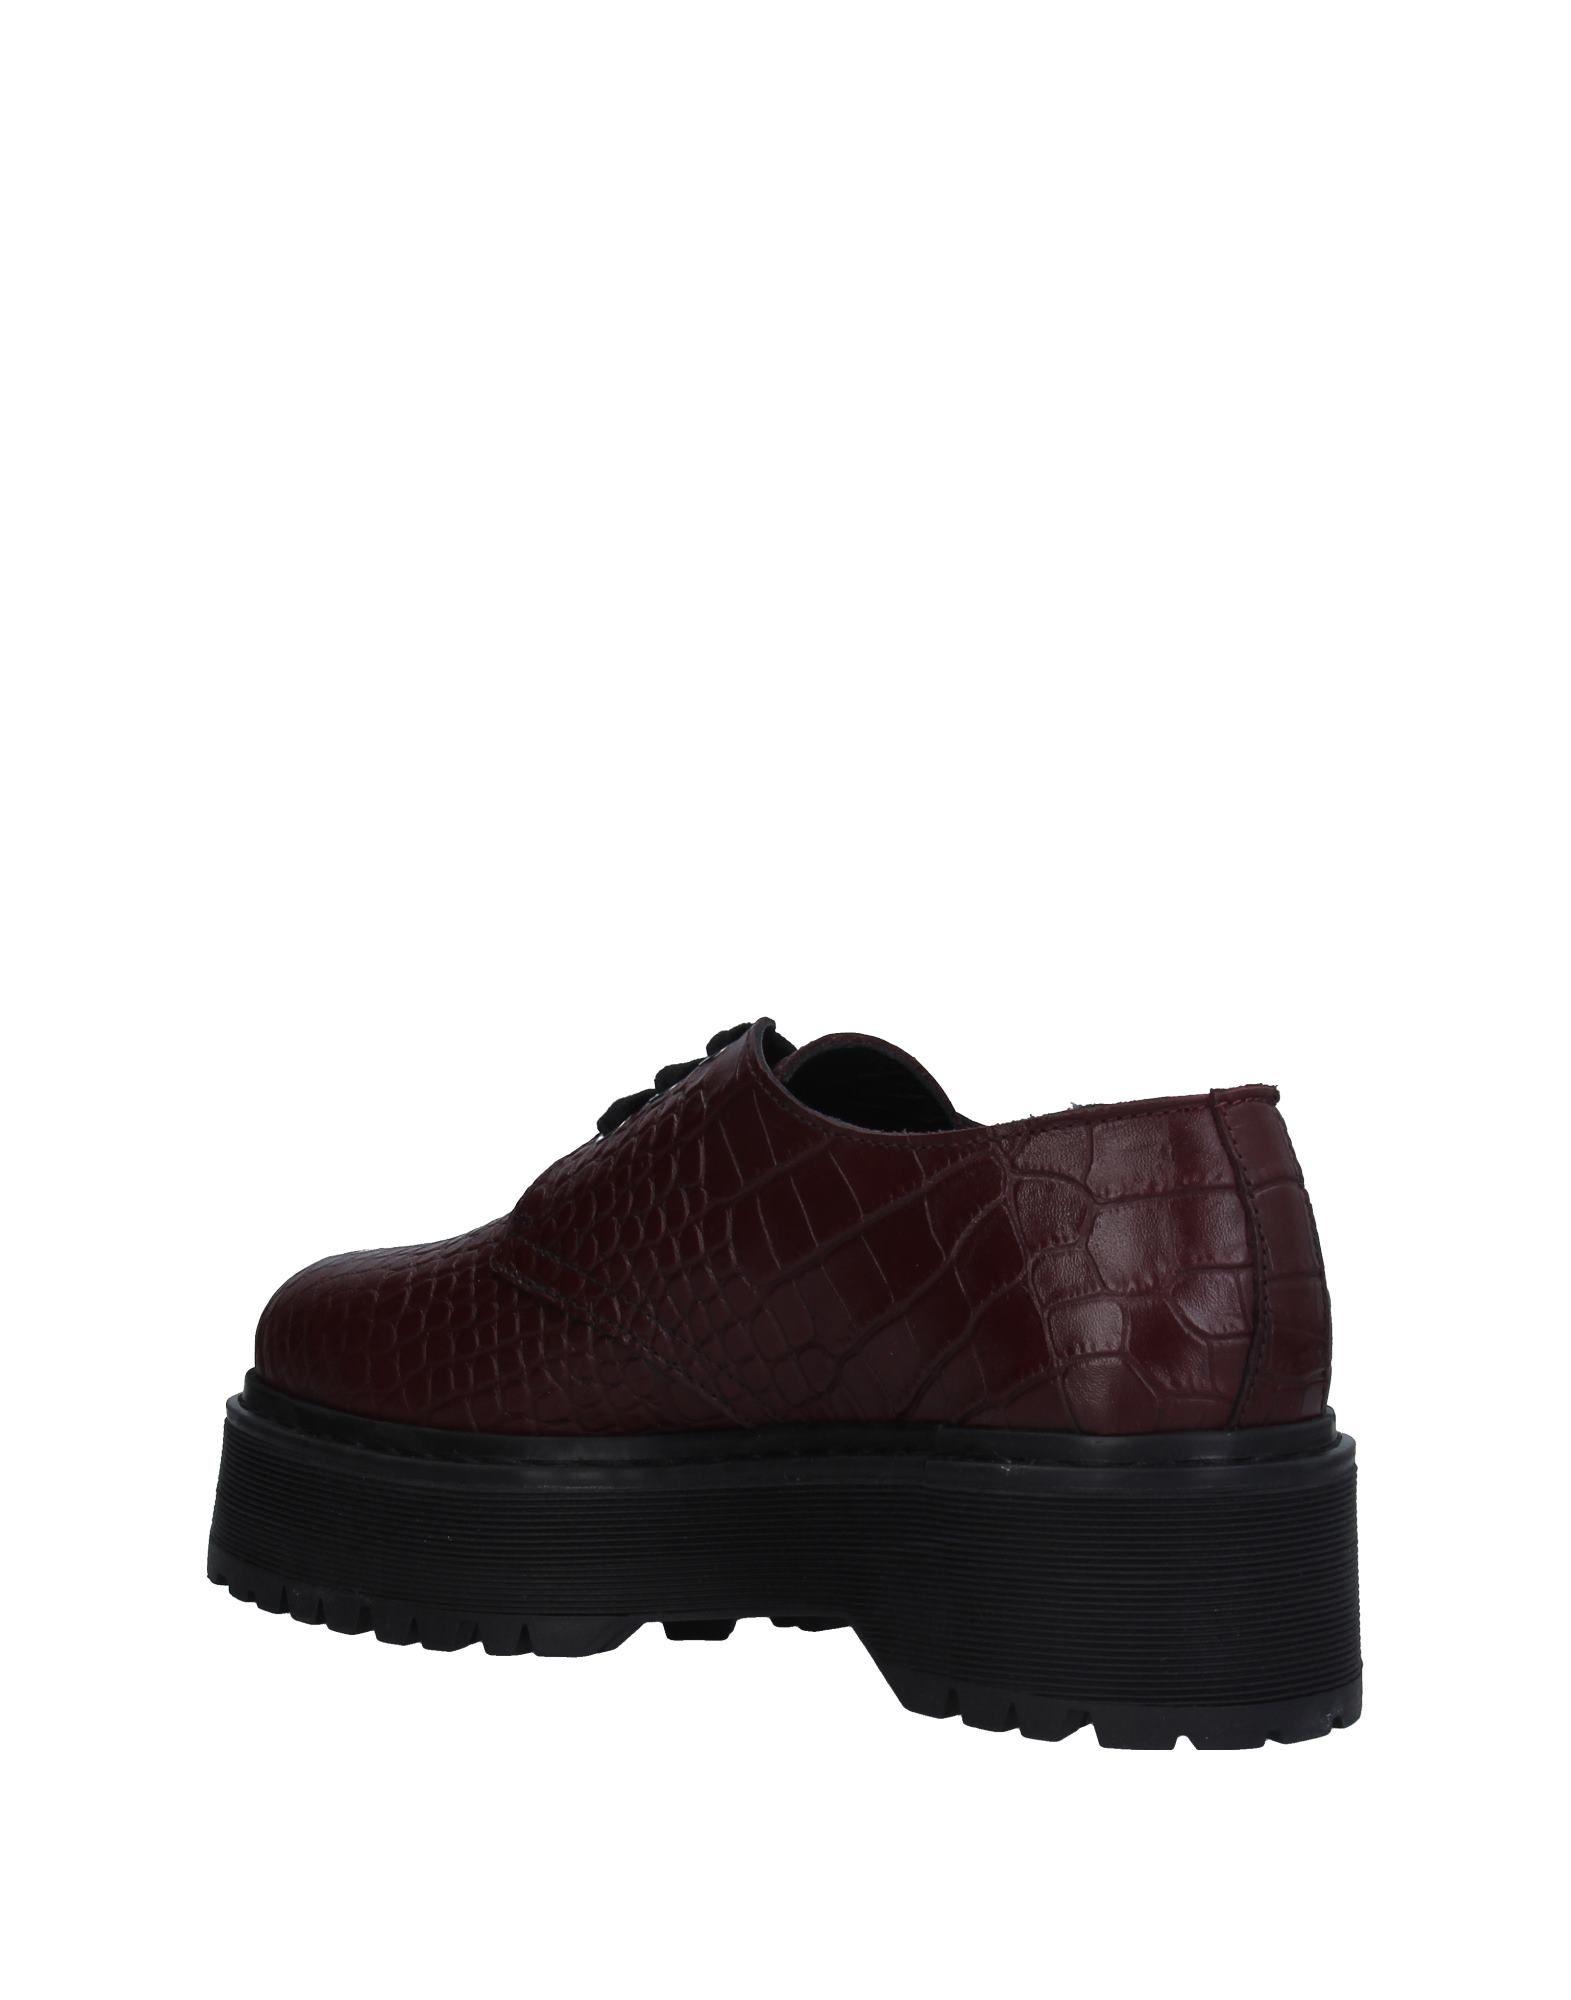 Pinko Schnürschuhe Damen  11327405MN Schuhe Heiße Schuhe 11327405MN eb0a34